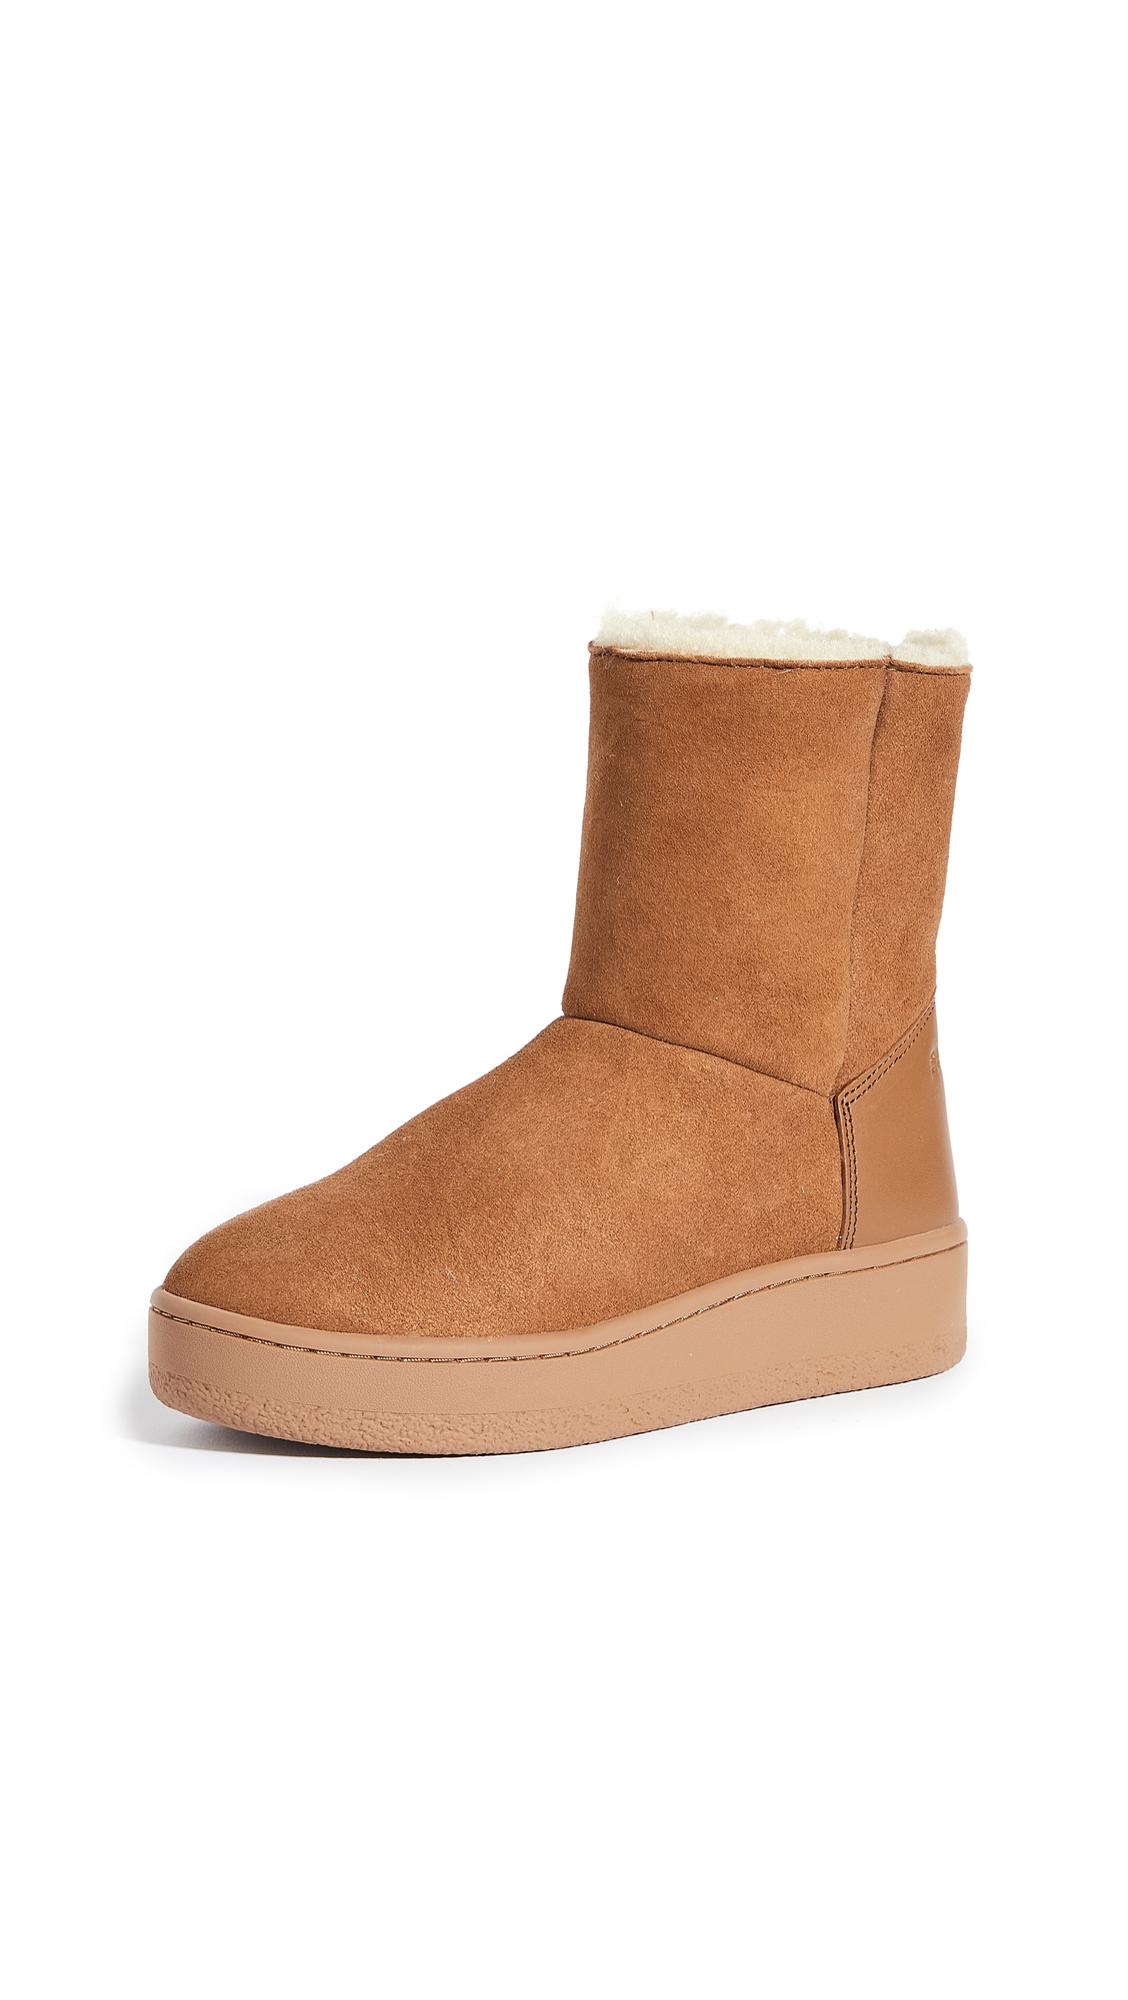 Rag & Bone Oslo Boots